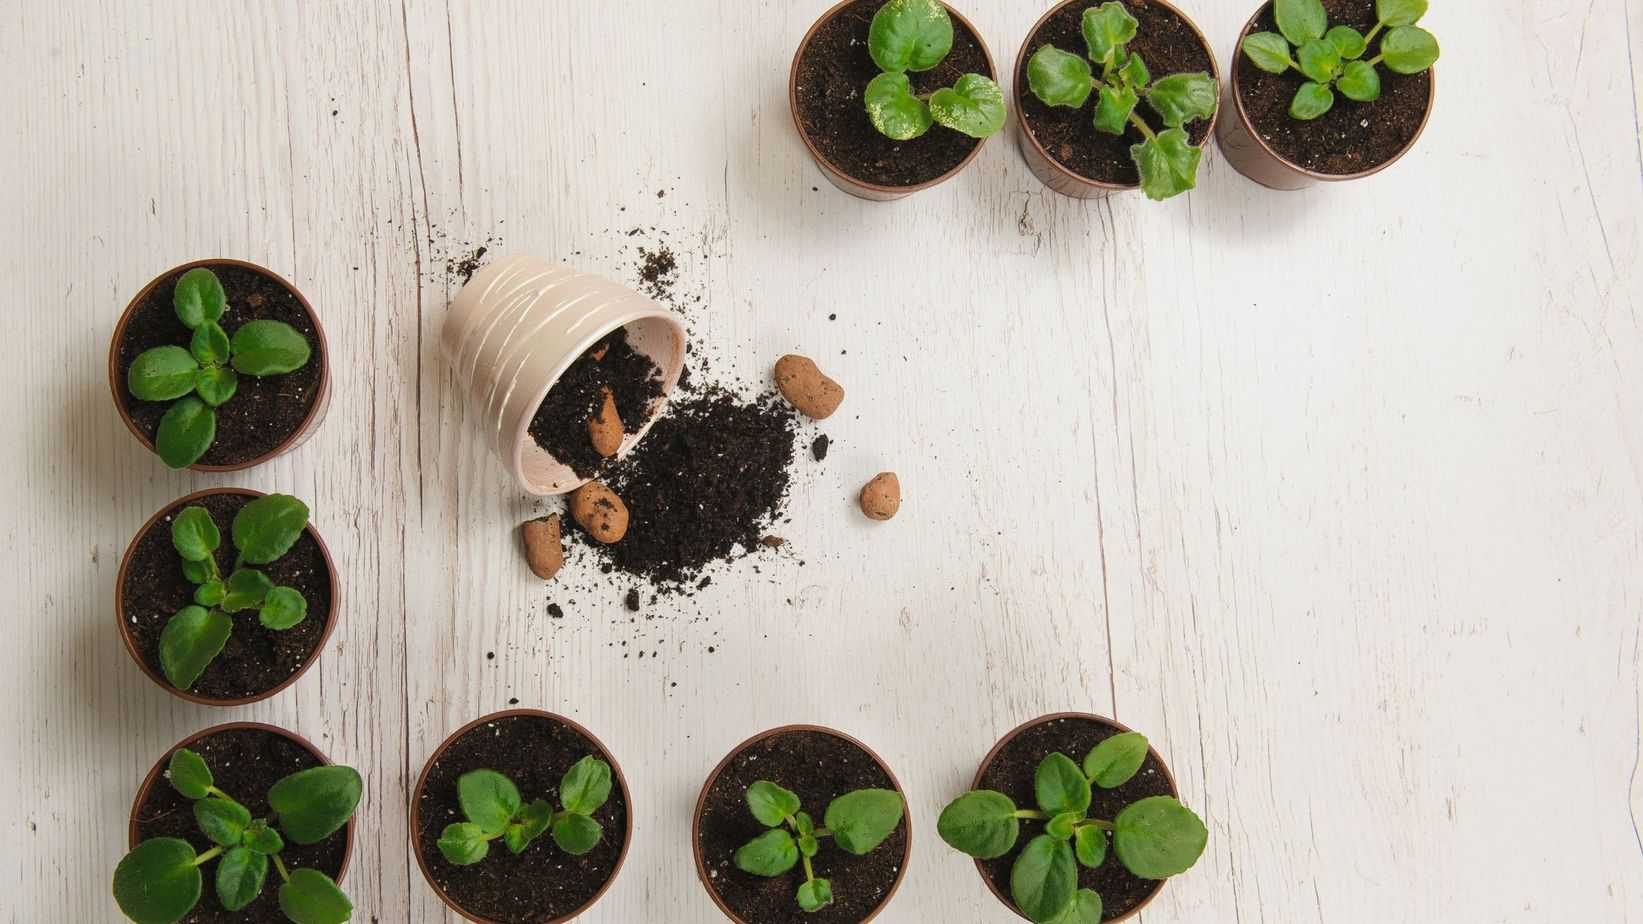 smart gardening gadgets